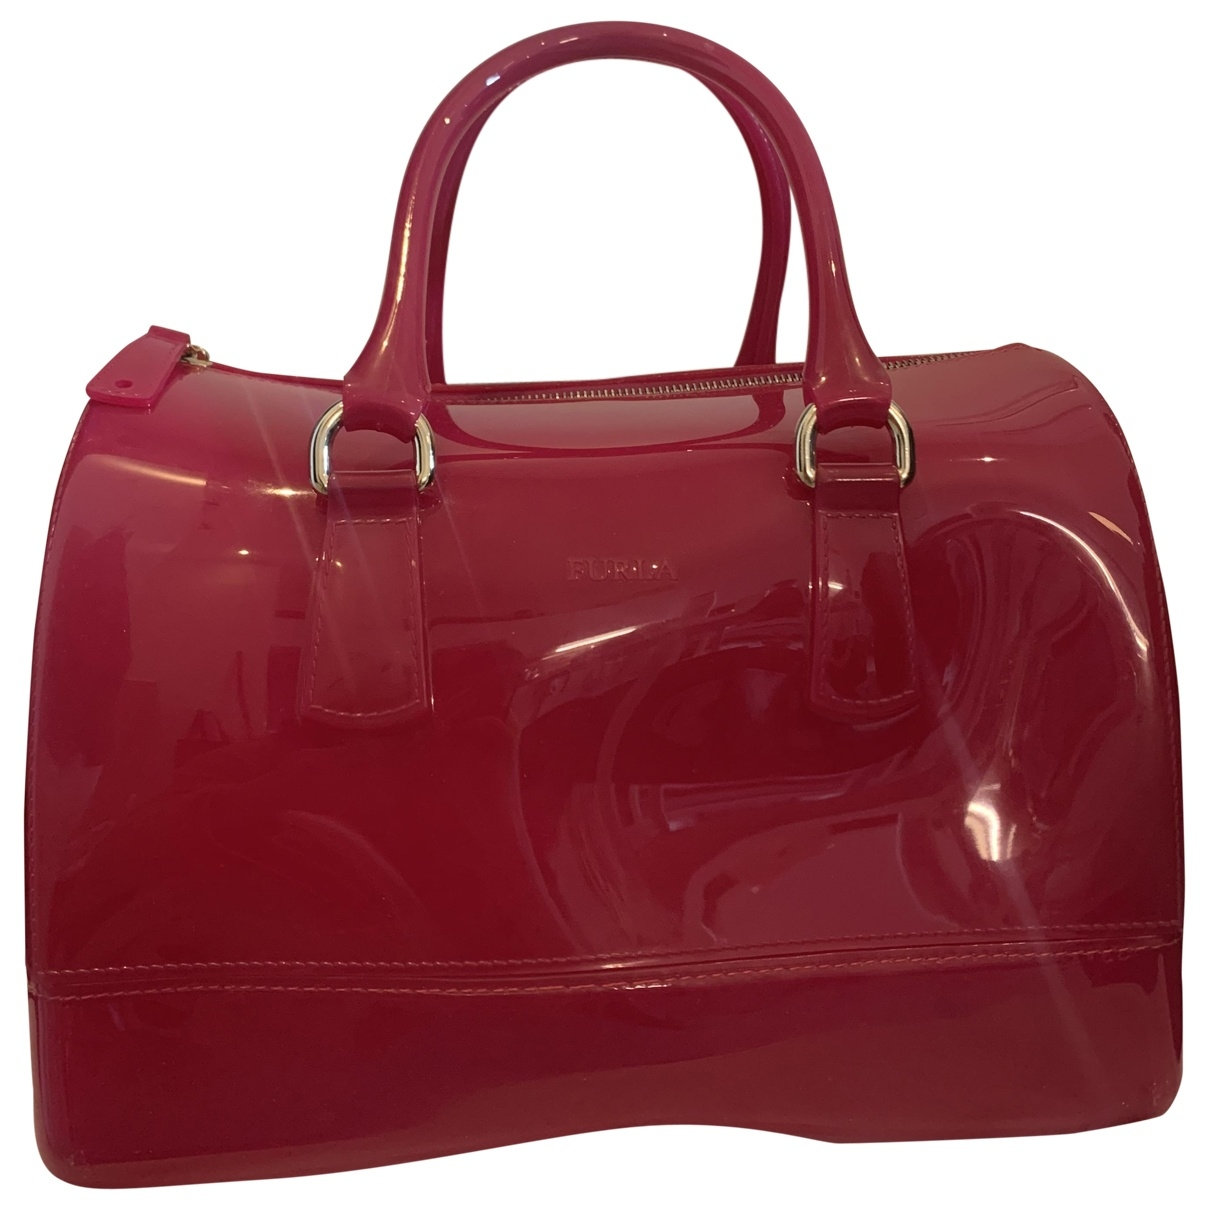 Furla - Sac a main Candy Bag pour femme - rose